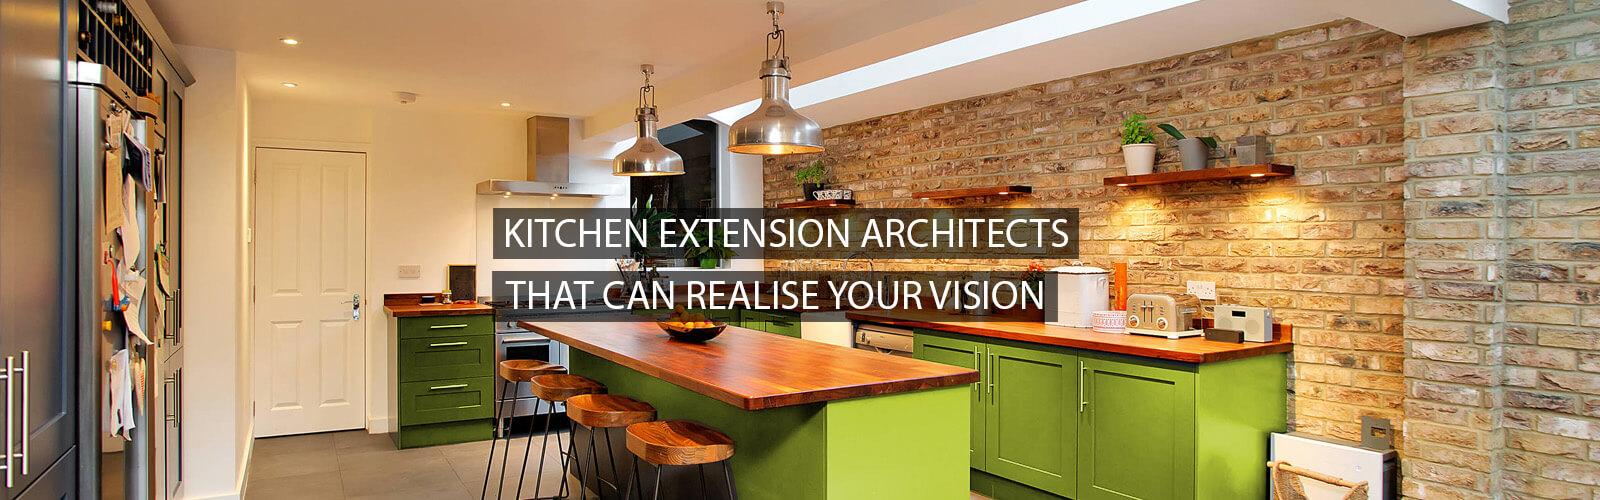 kitchen extension architects